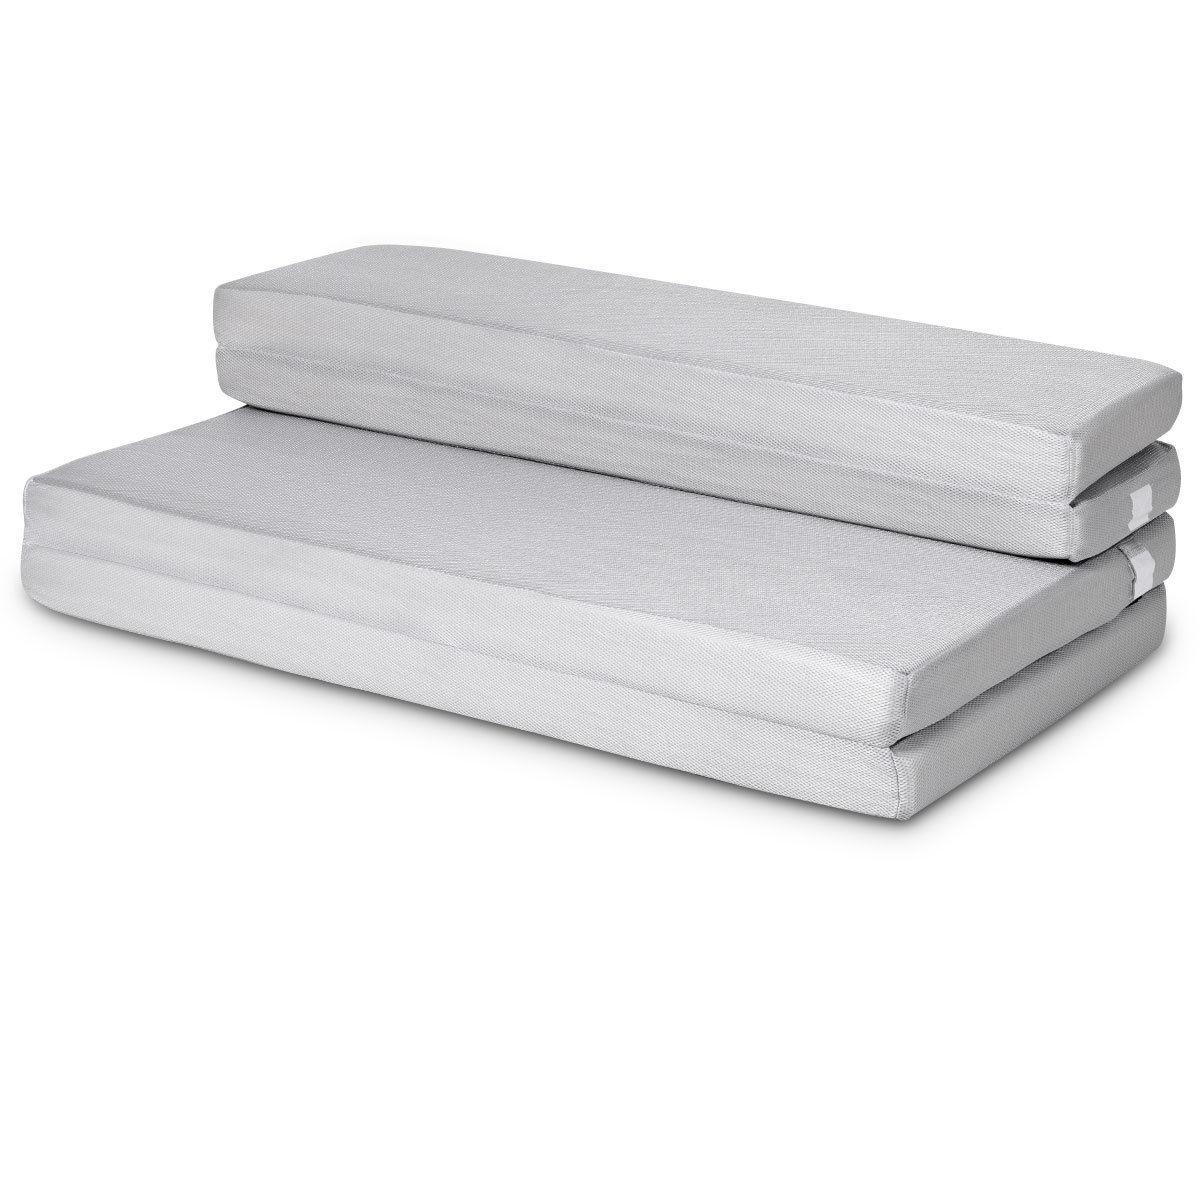 Gymax 4'' Full XL Size Foam Folding Mattress Sofa Bed Guests Floor